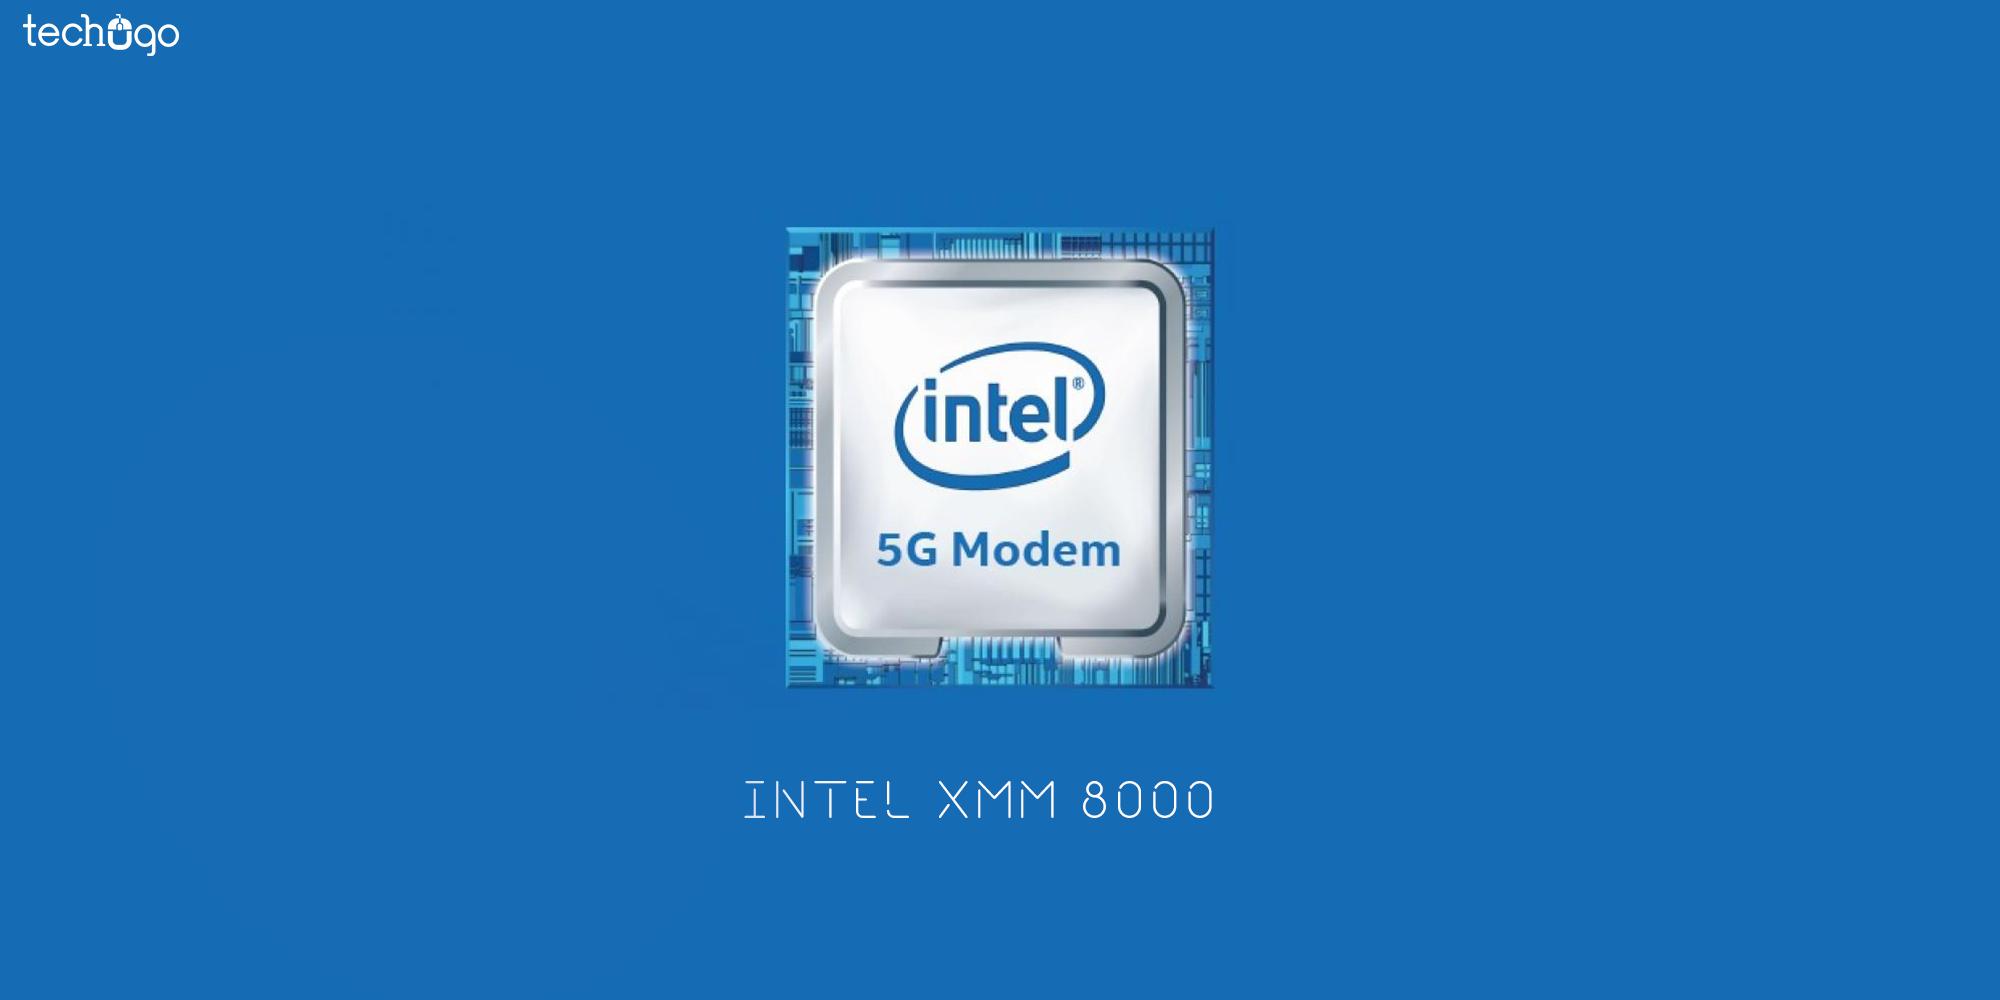 Intel XMM 8000